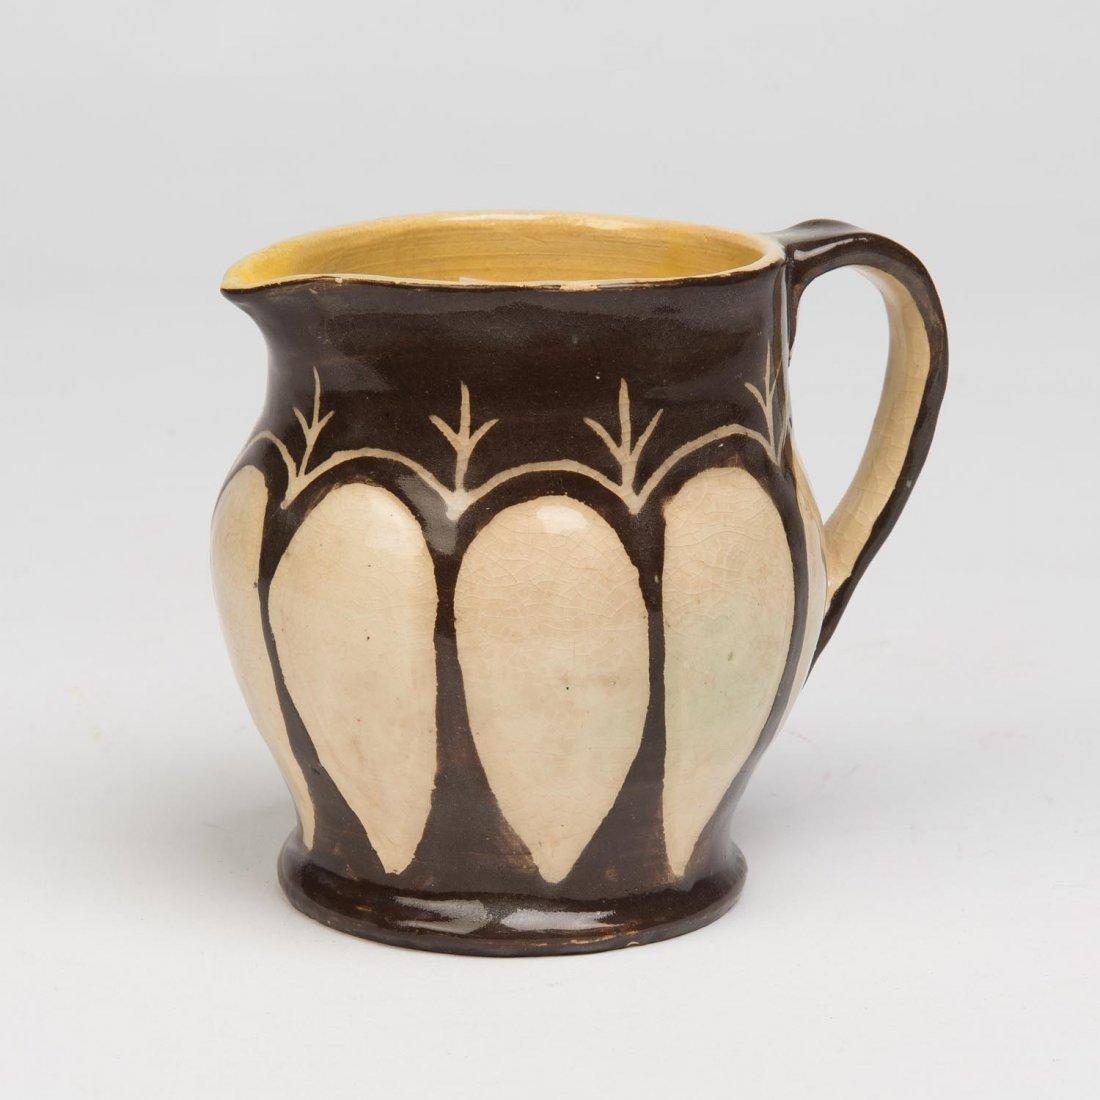 Marguerite Mahood (1901-1989)  A wheel thrown glazed